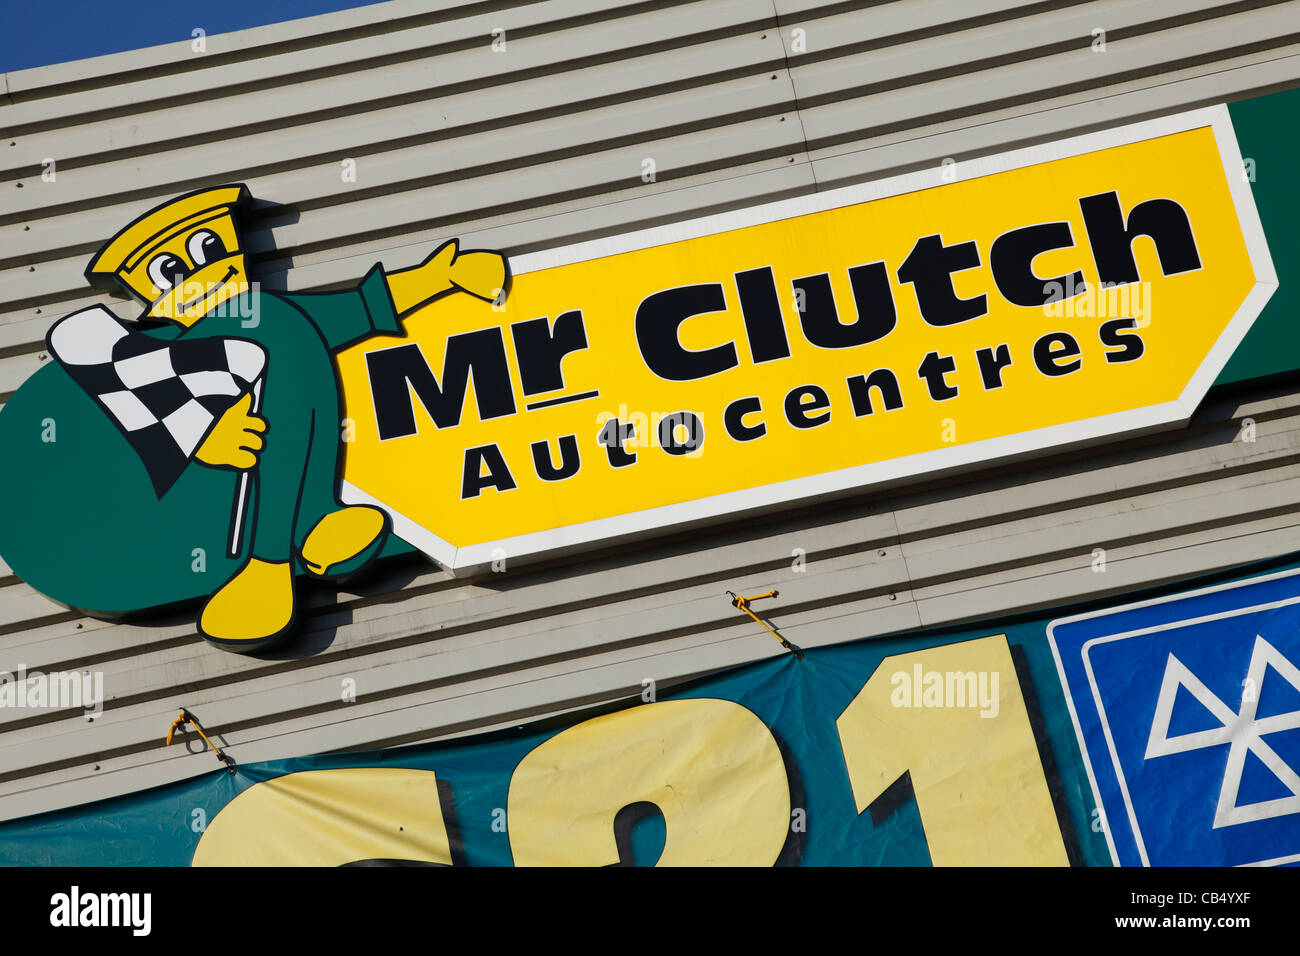 A Mr Clutch Autocentre in Nottingham, England, U.K. - Stock Image